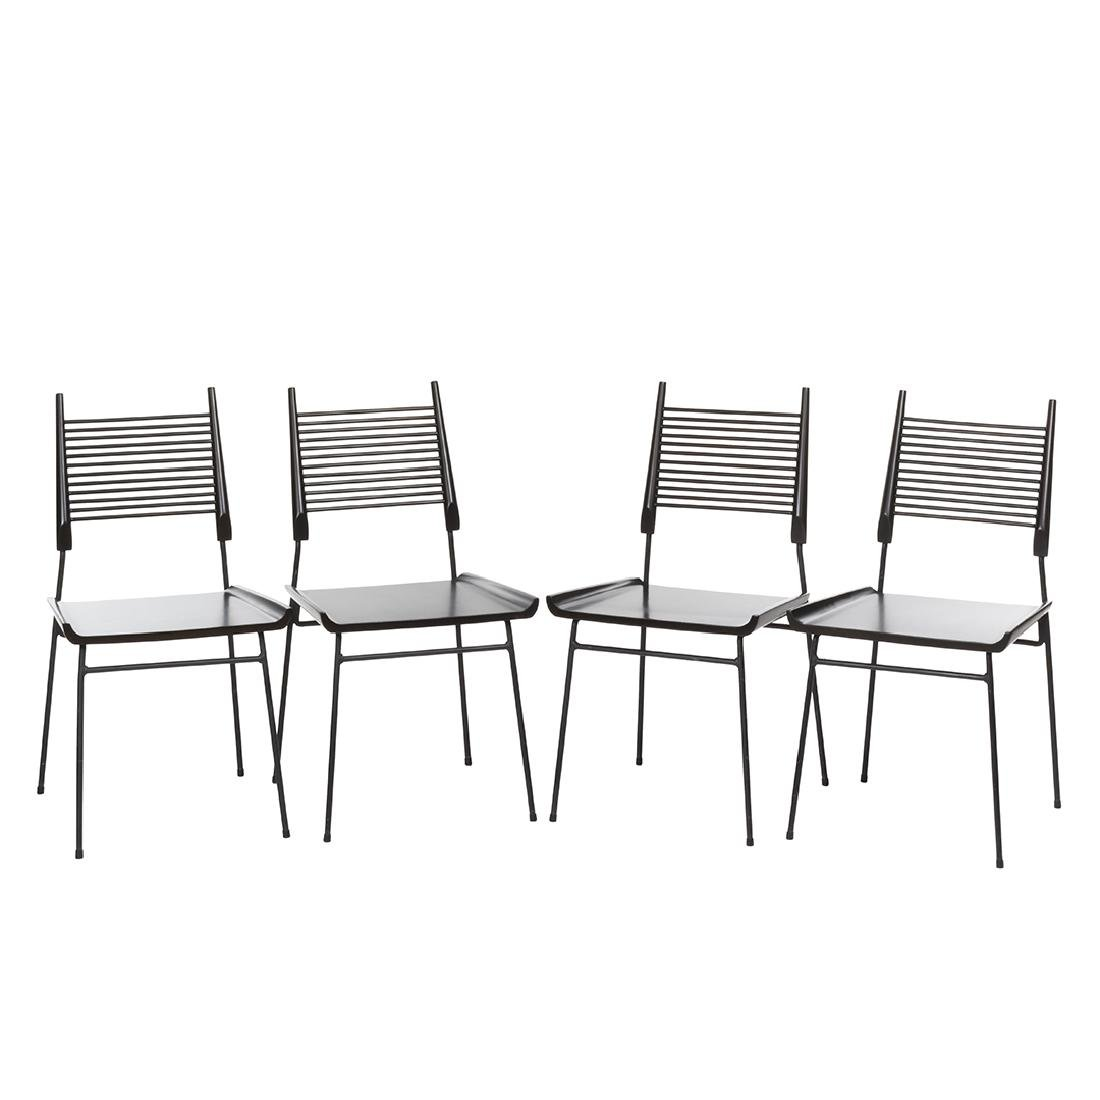 Paul McCobb Shovel Chairs (4)